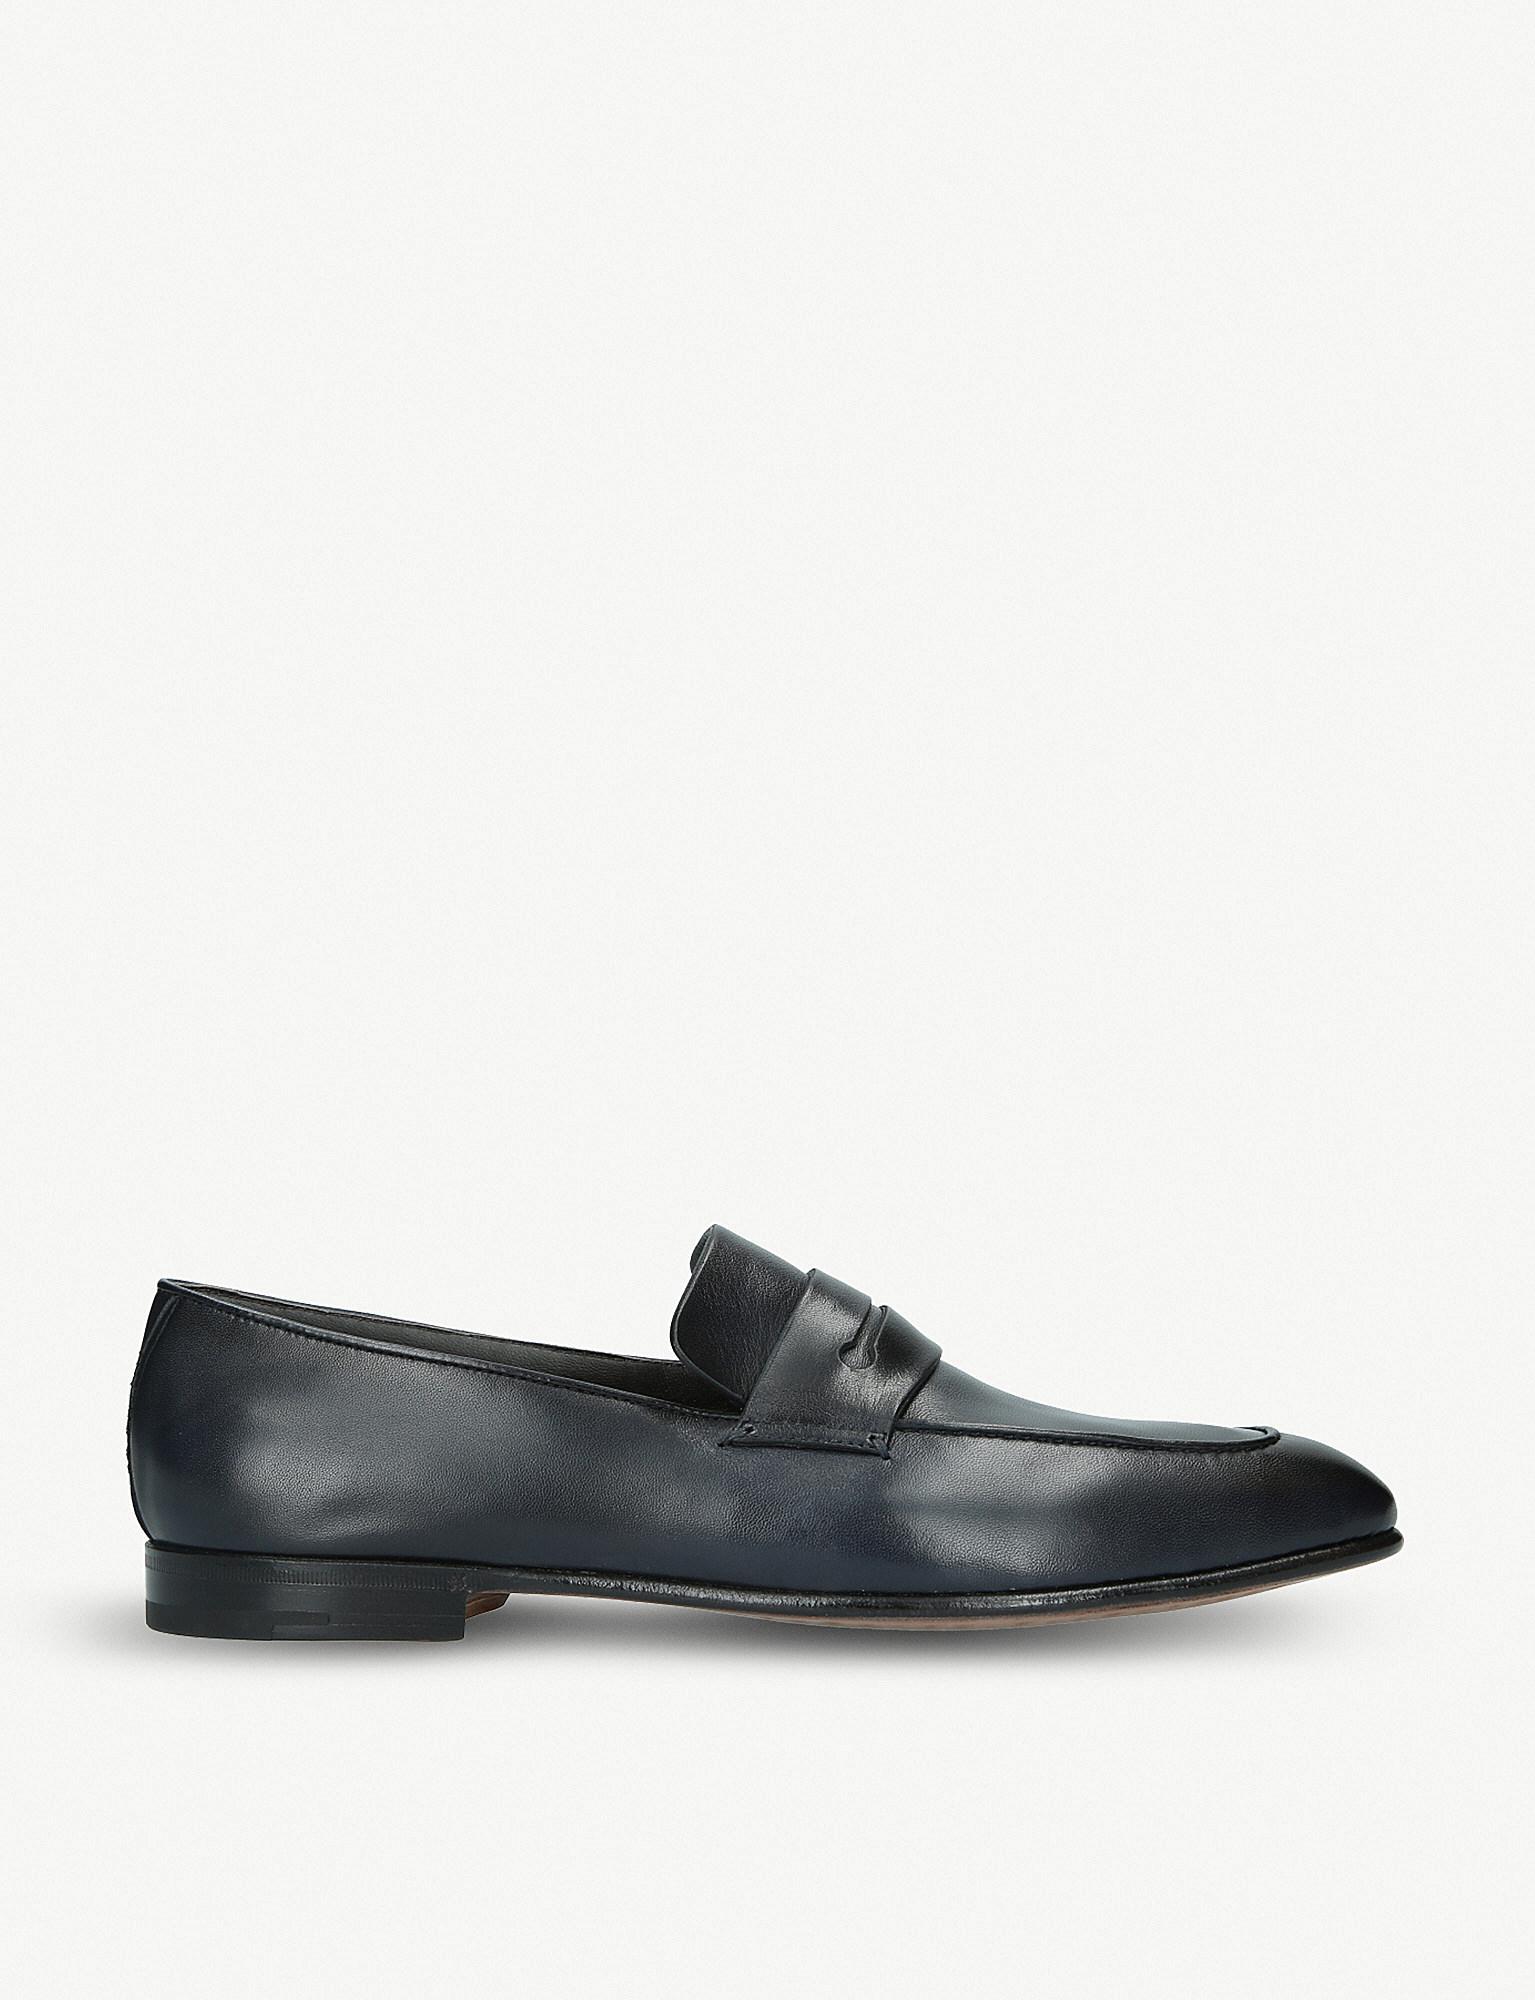 093cebae51a Lyst - Ermenegildo Zegna Asola Leather Penny Loafers in Blue for Men